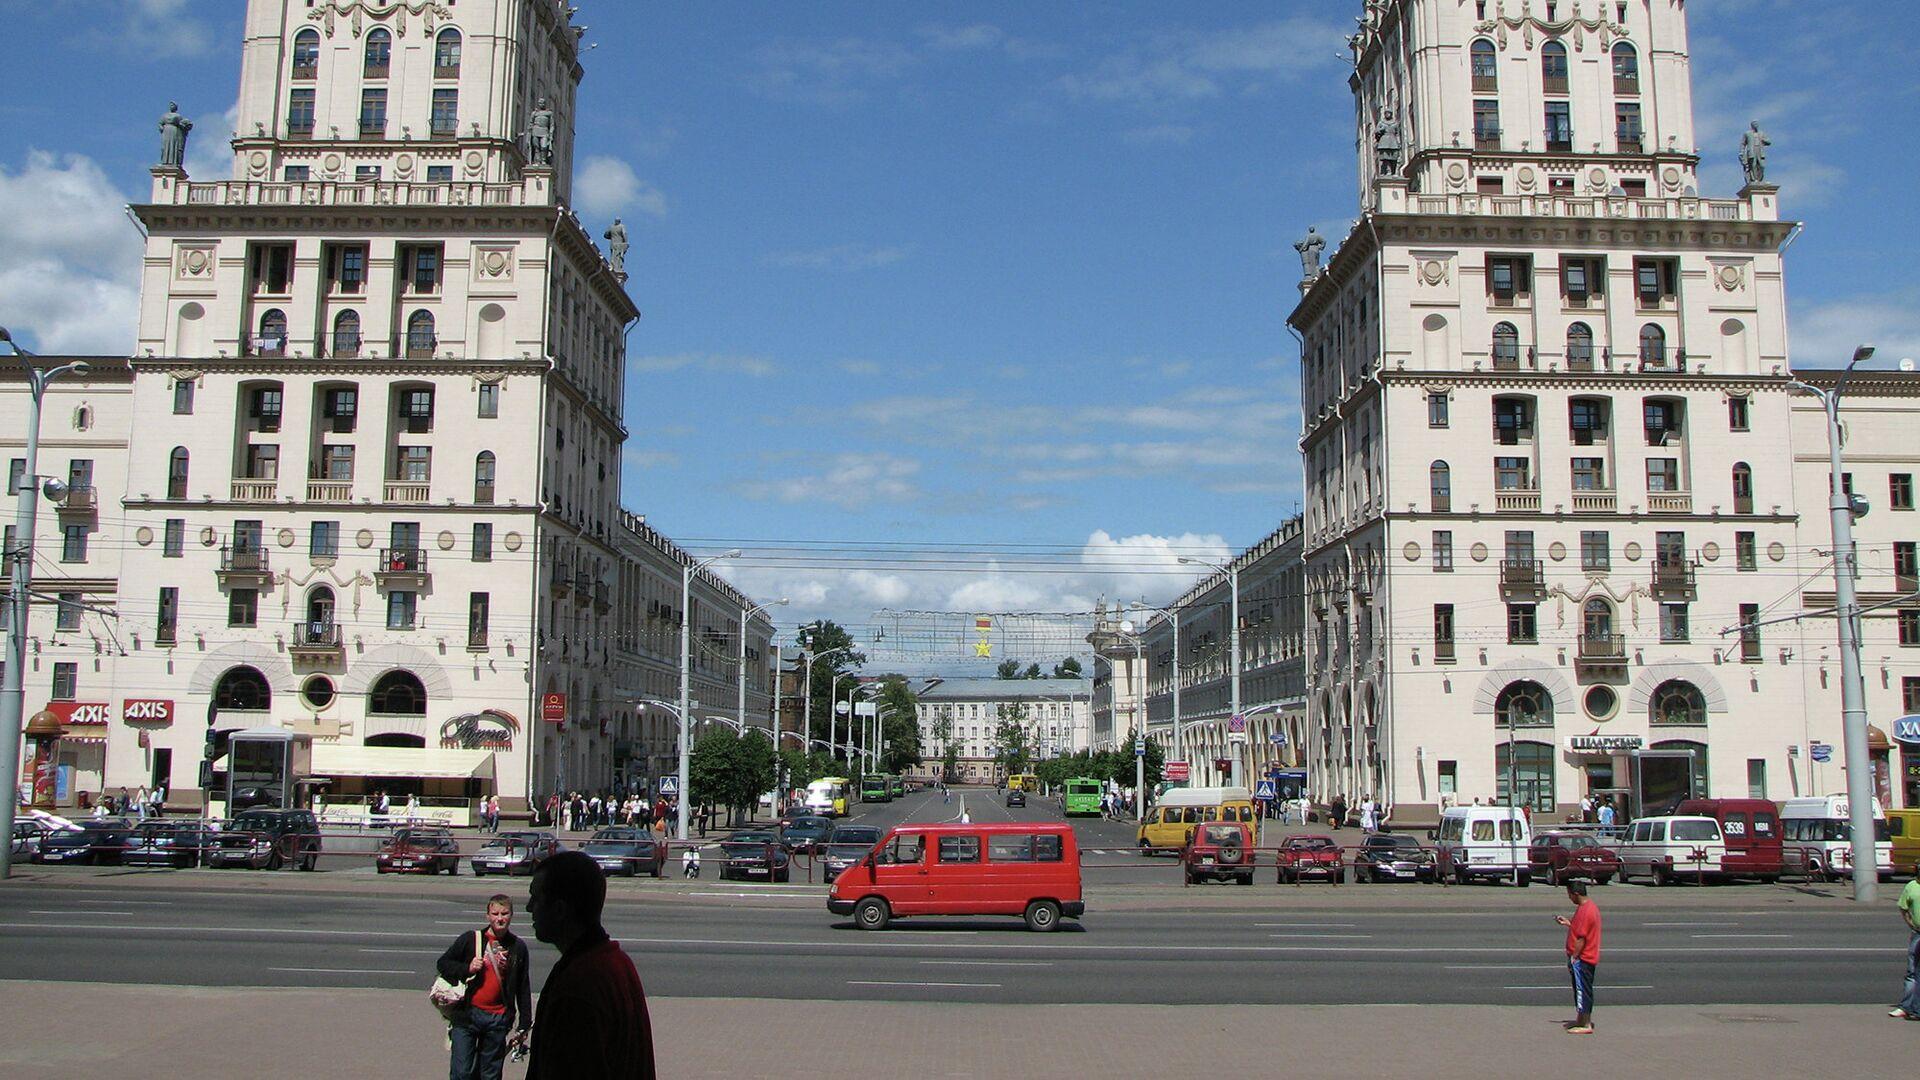 Город Минск - РИА Новости, 1920, 13.04.2021